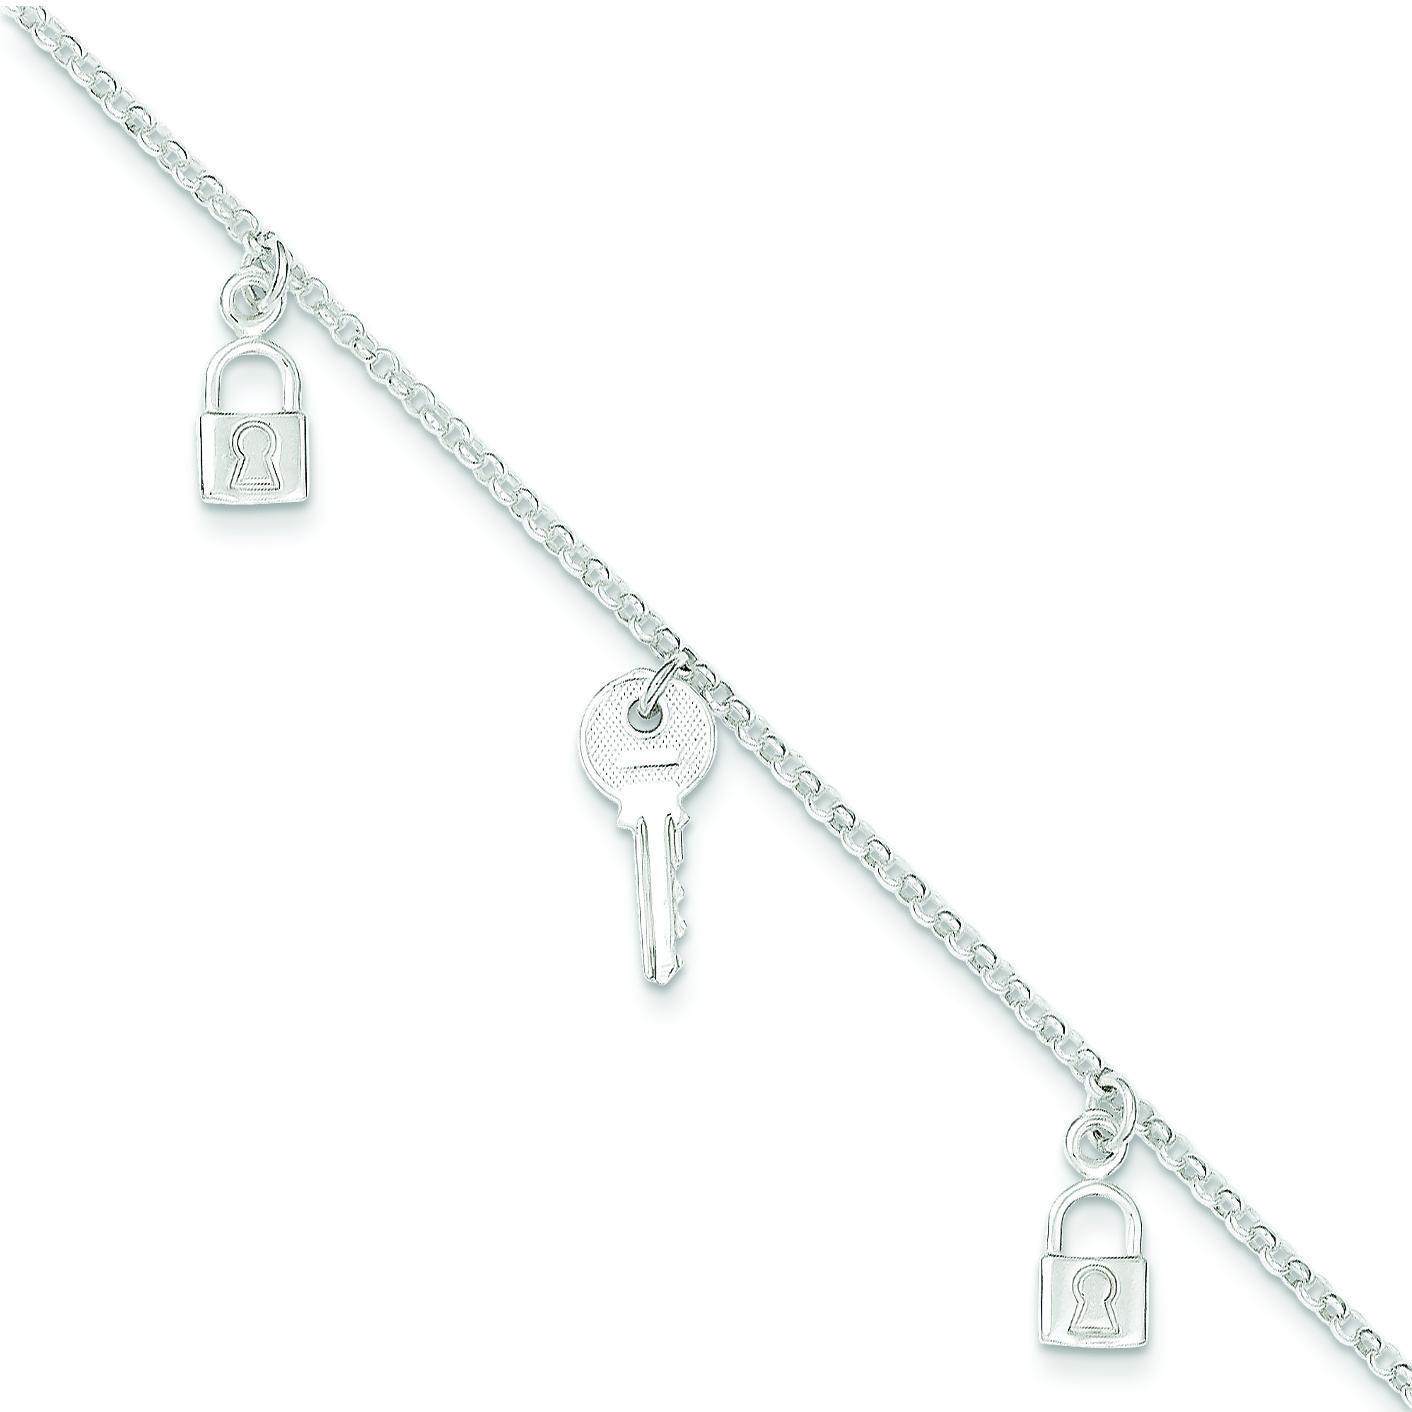 Lock Key Anklet in Sterling Silver